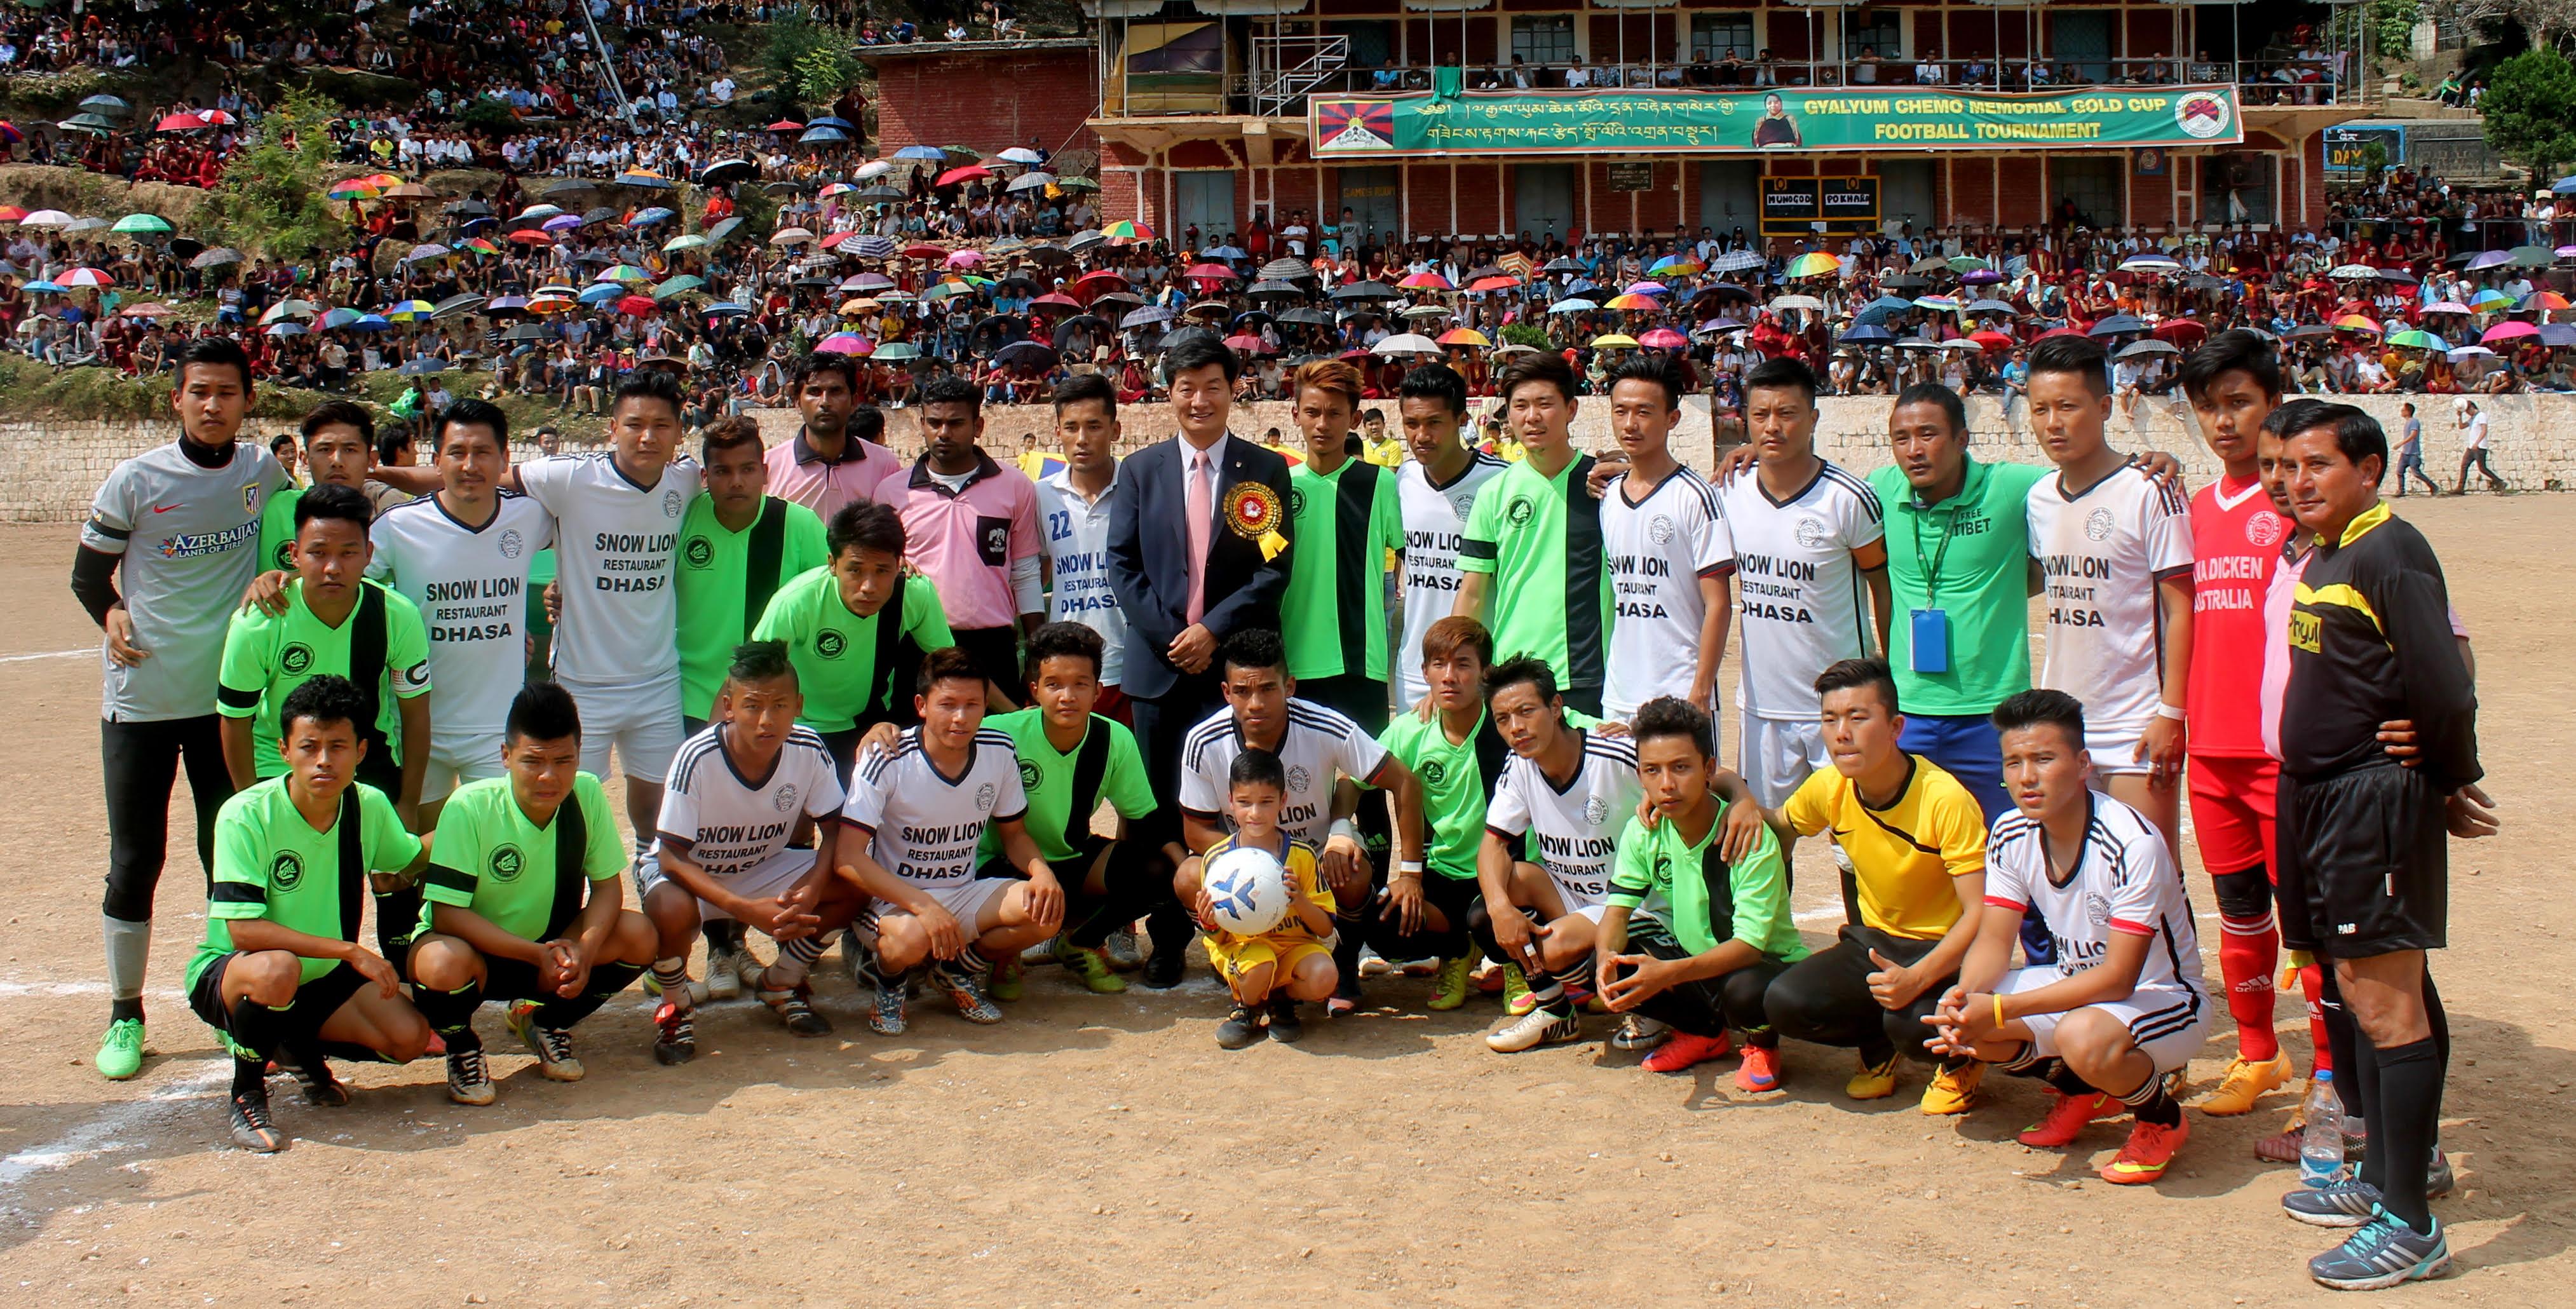 Sikyong Dr. Lobsang Sangay at the Gyalyum Chenmo Memorial Gold Cup organised annually by TNSA